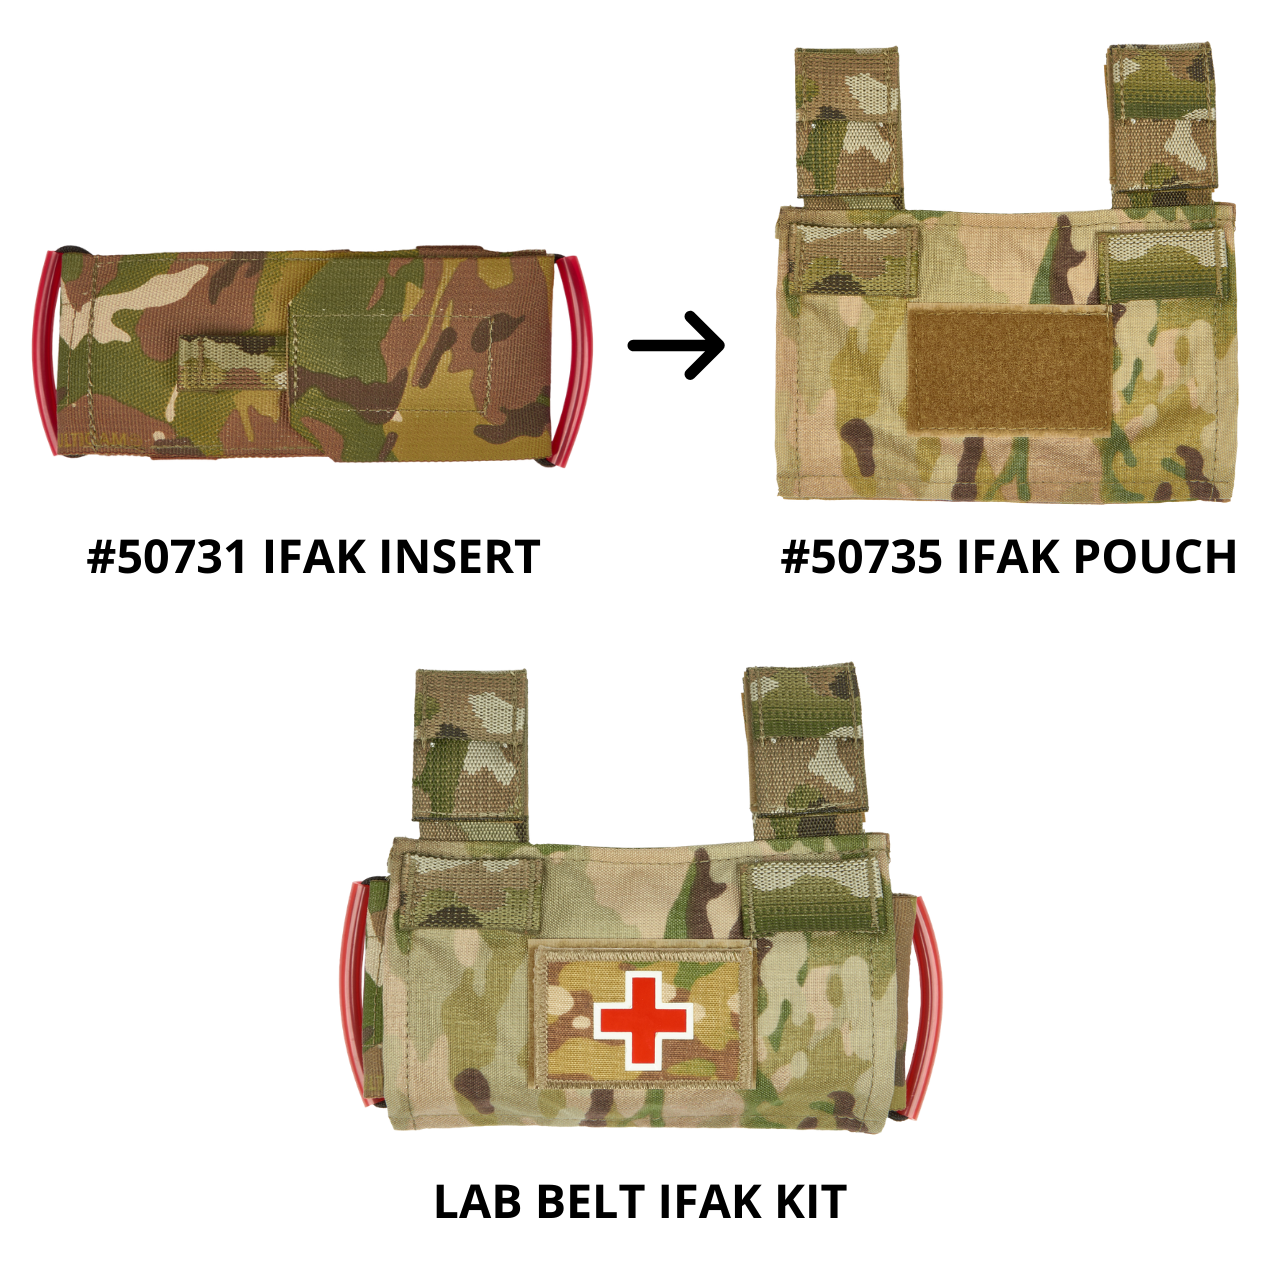 50731 ifak insert with 50735 ifak pouch